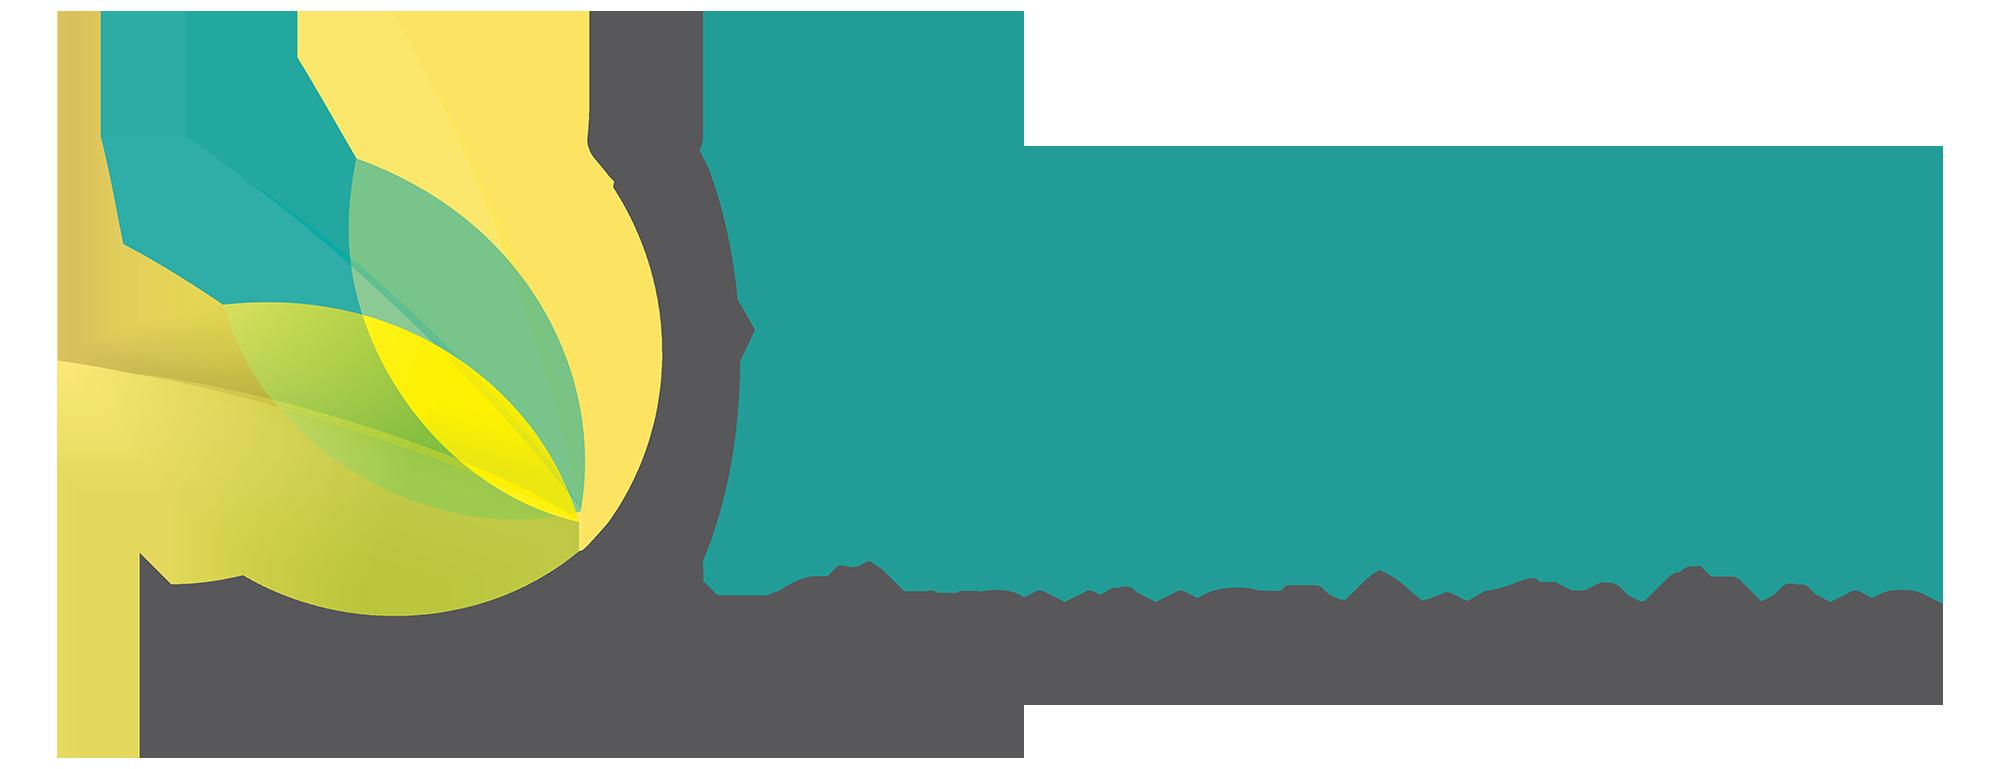 Functional Medicine Coaching Academy (FMCA)